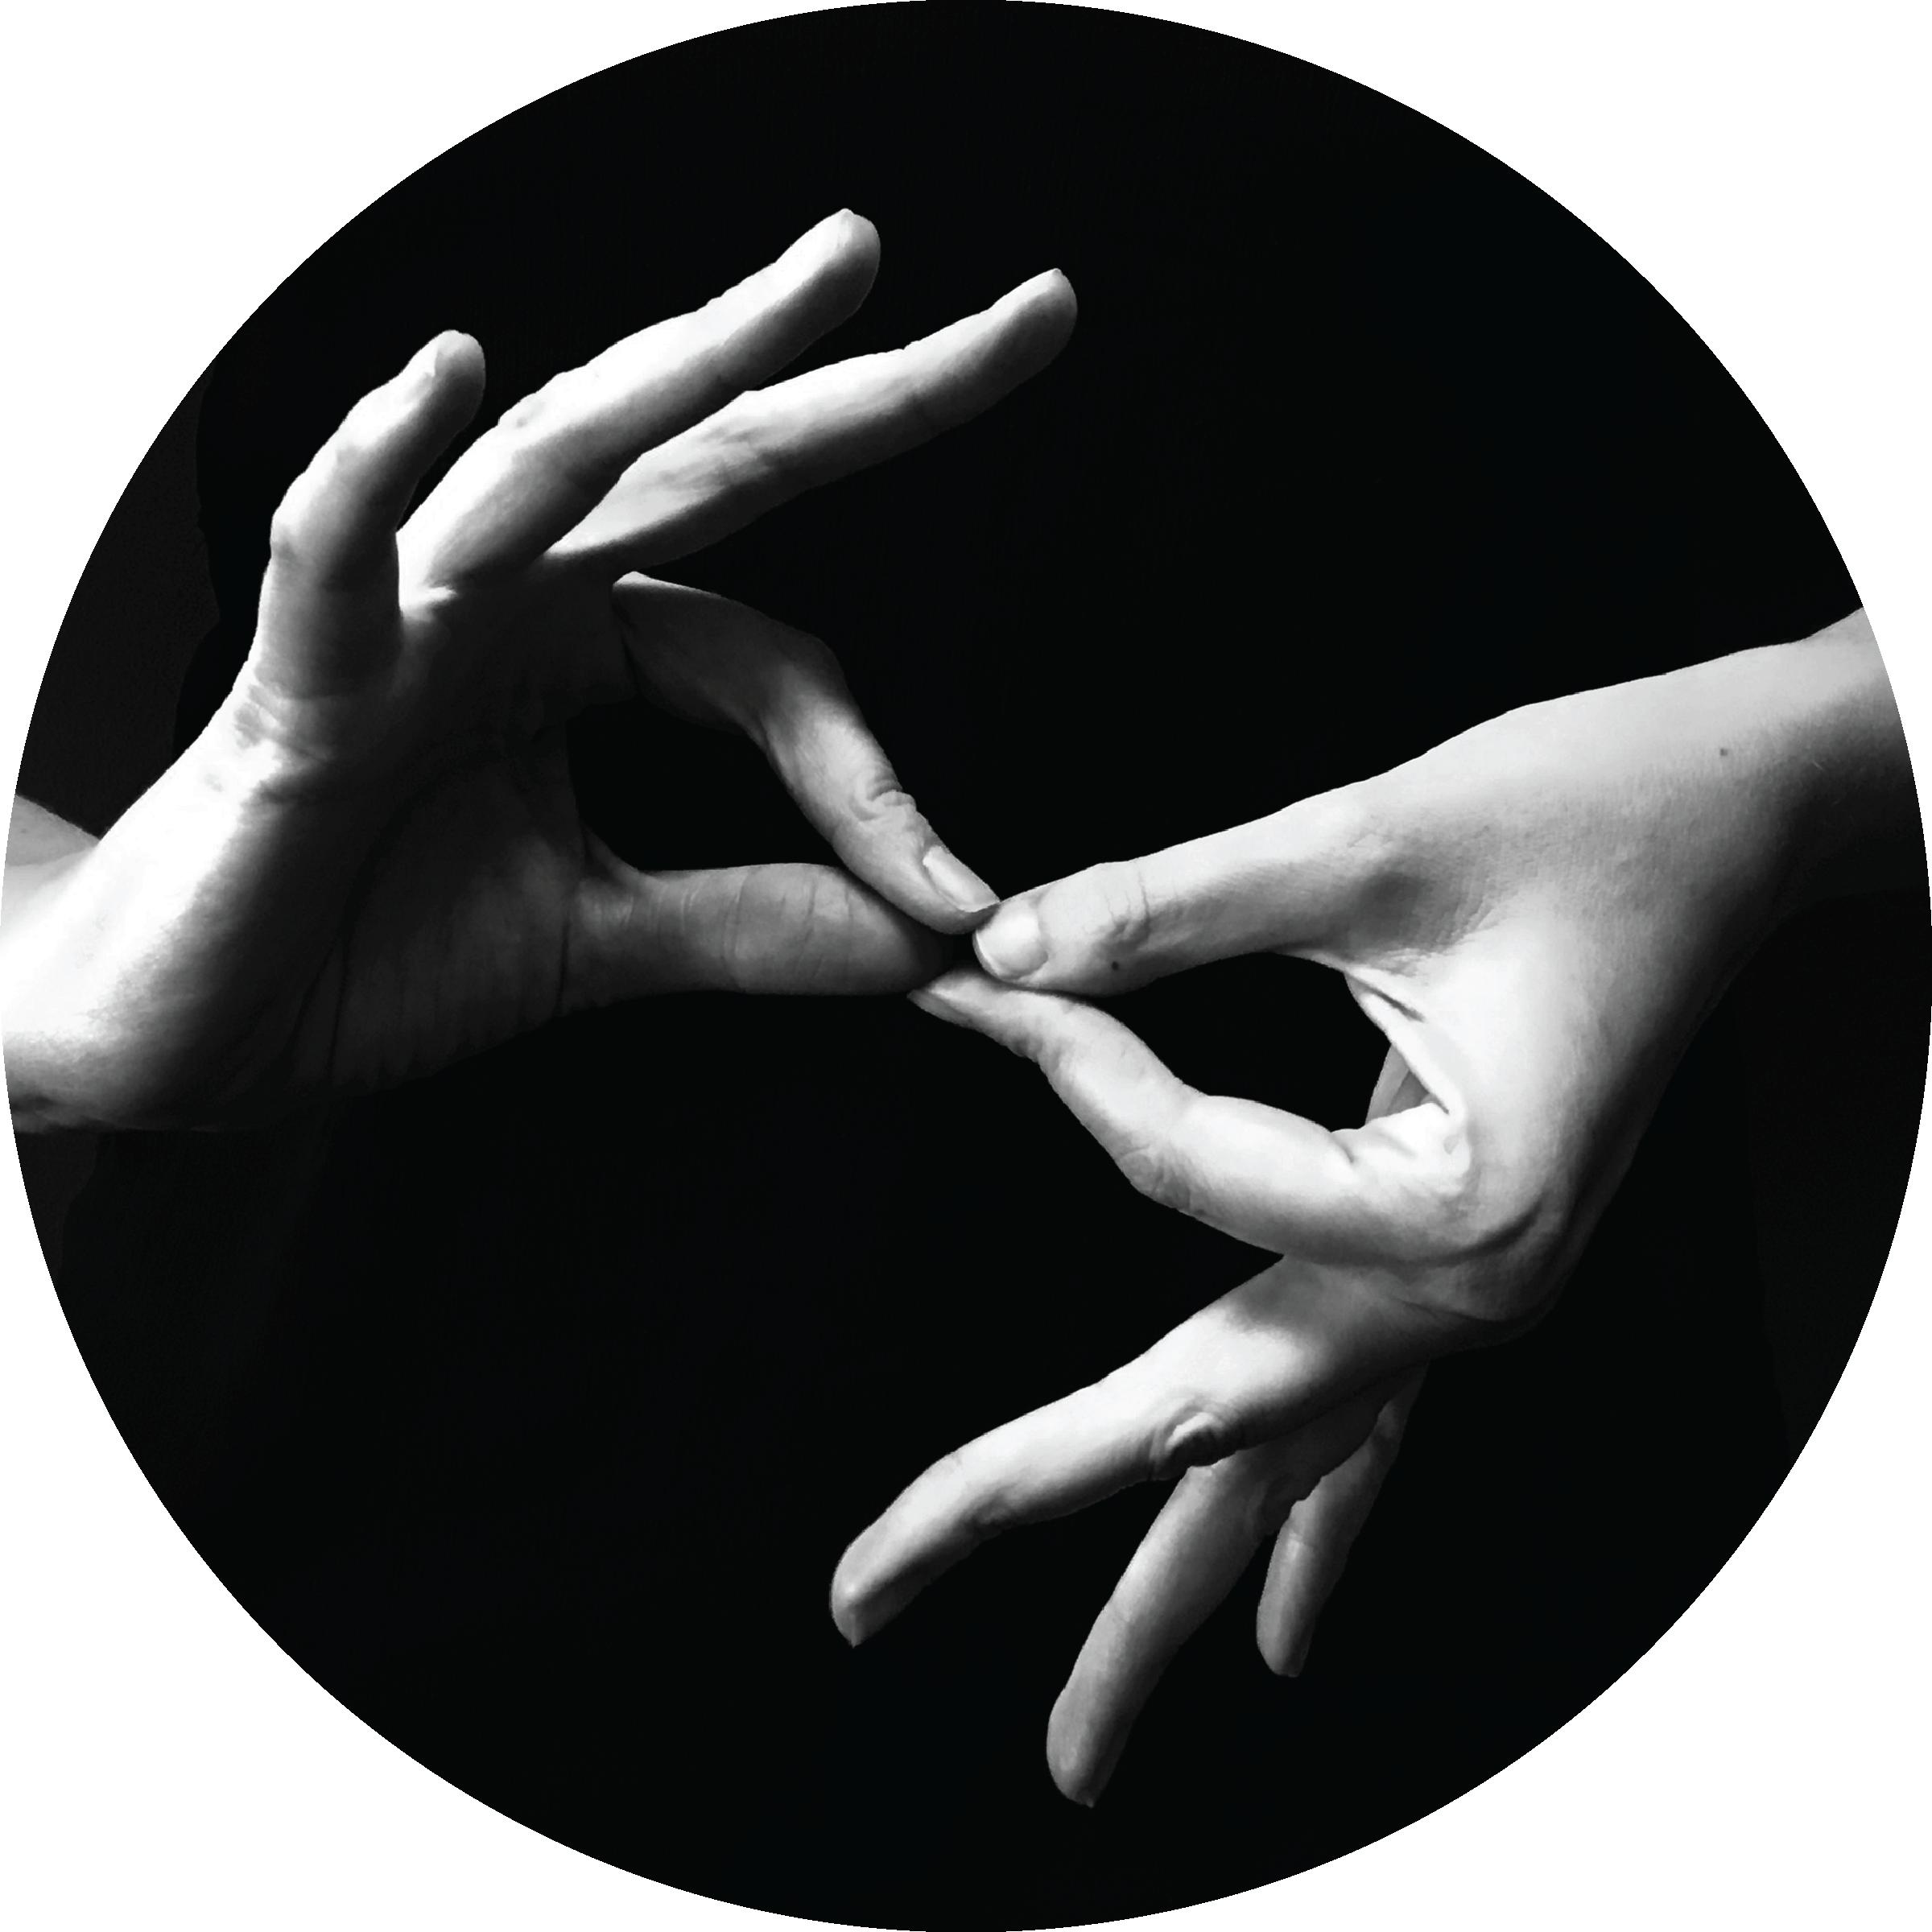 Interpreting services denver colorado serving the Deaf and Hearing community